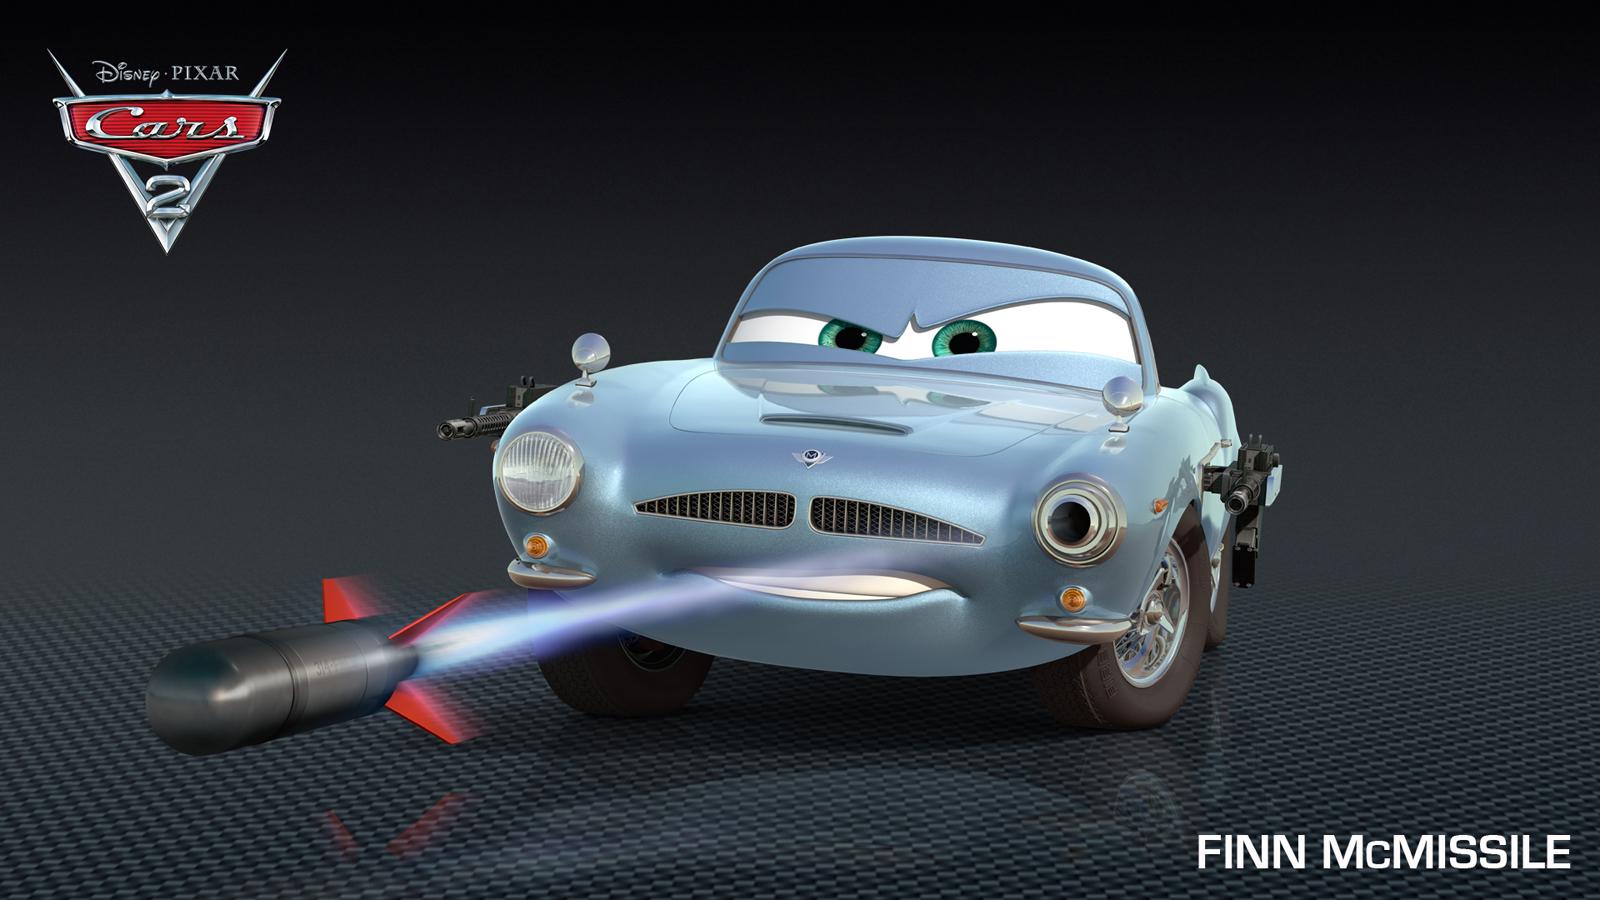 http://4.bp.blogspot.com/-WyhX73WU_L0/TVSylSgzXEI/AAAAAAAAlZ4/RnEz4XN0sAg/s1600/Cars2_FinnMcMissile_02.jpg